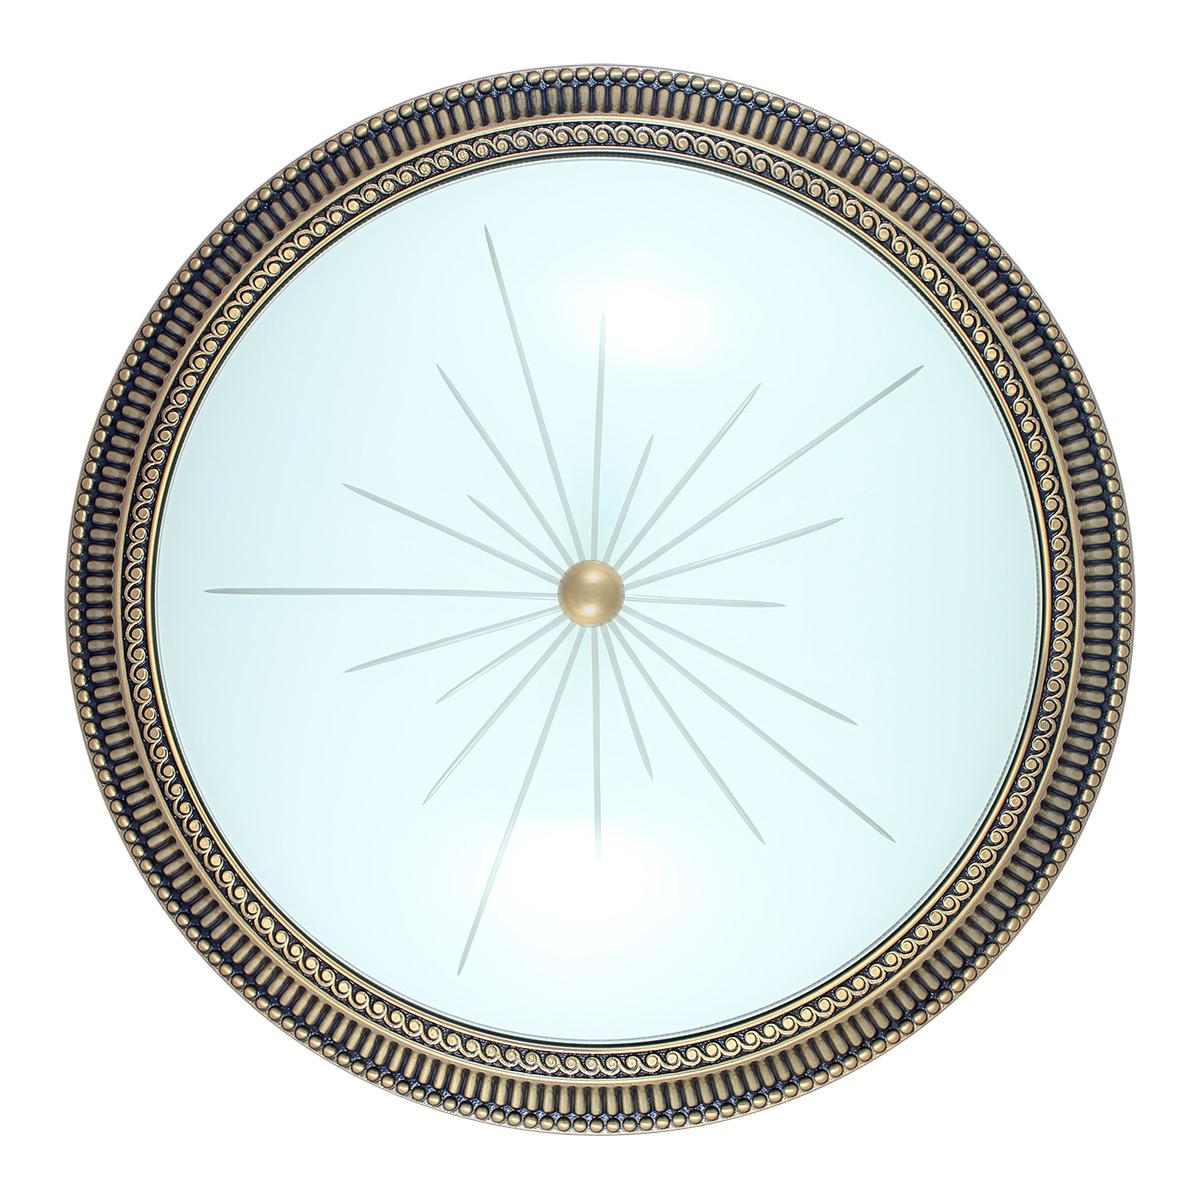 Imagem de Plafoniera in bronzo - Stile rigato - Diametro 50,6 cm